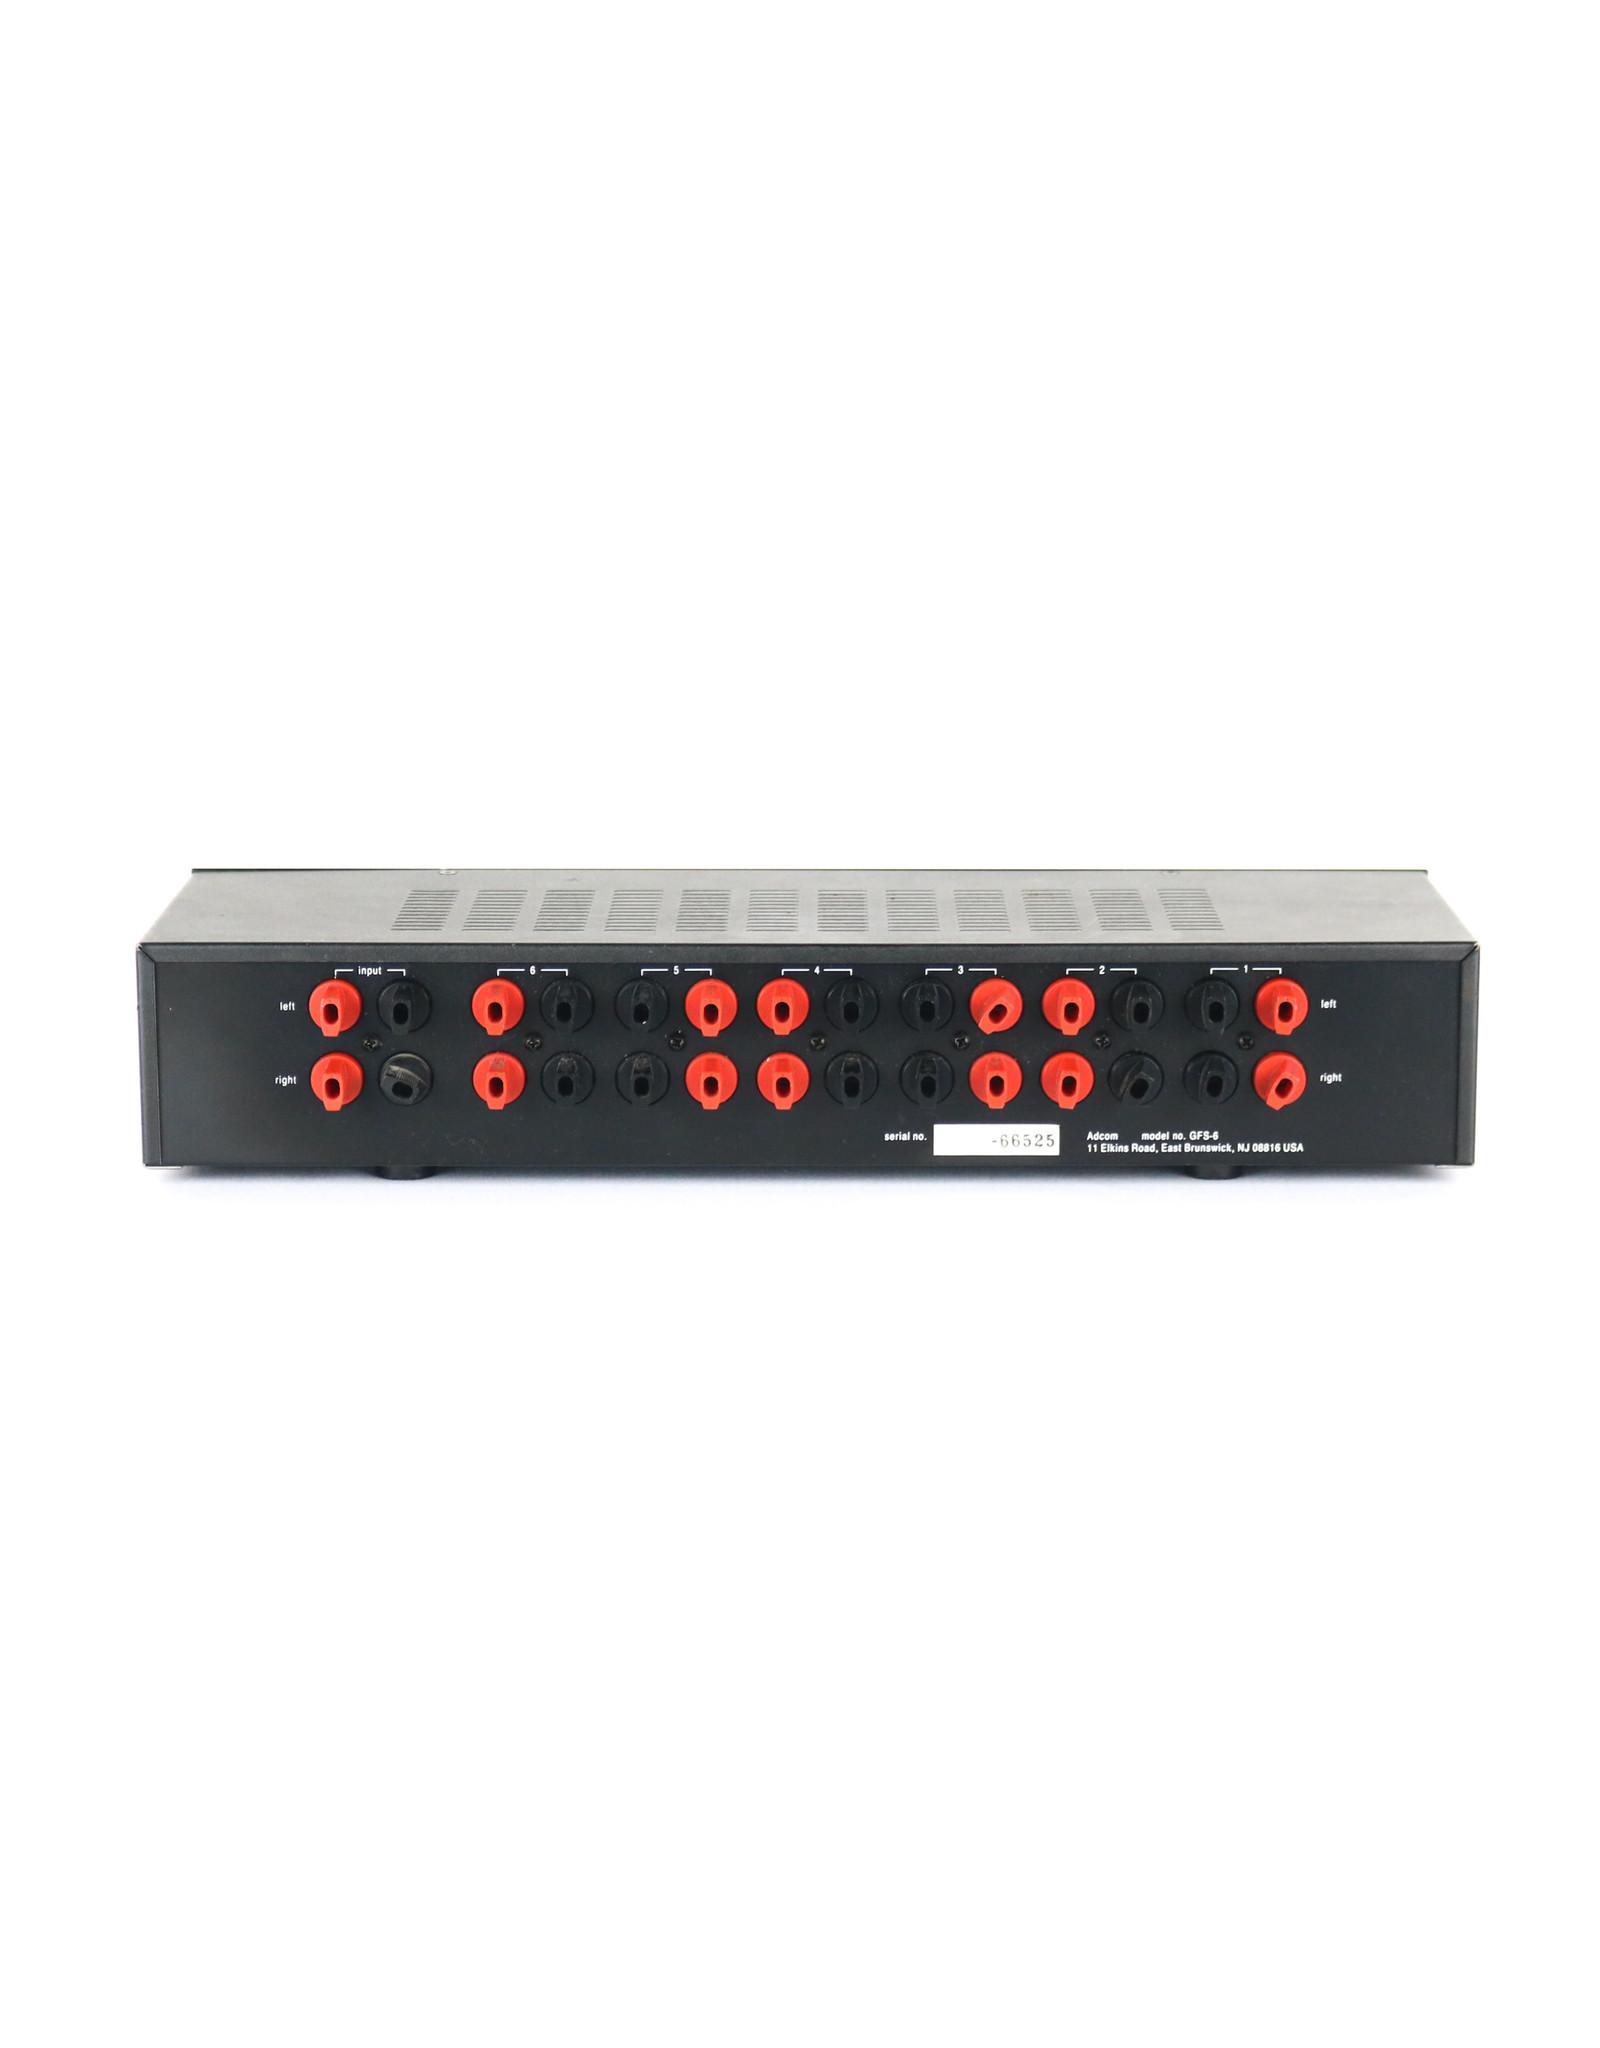 Adcom Adcom GFS-6 Speaker Selector Switch USED